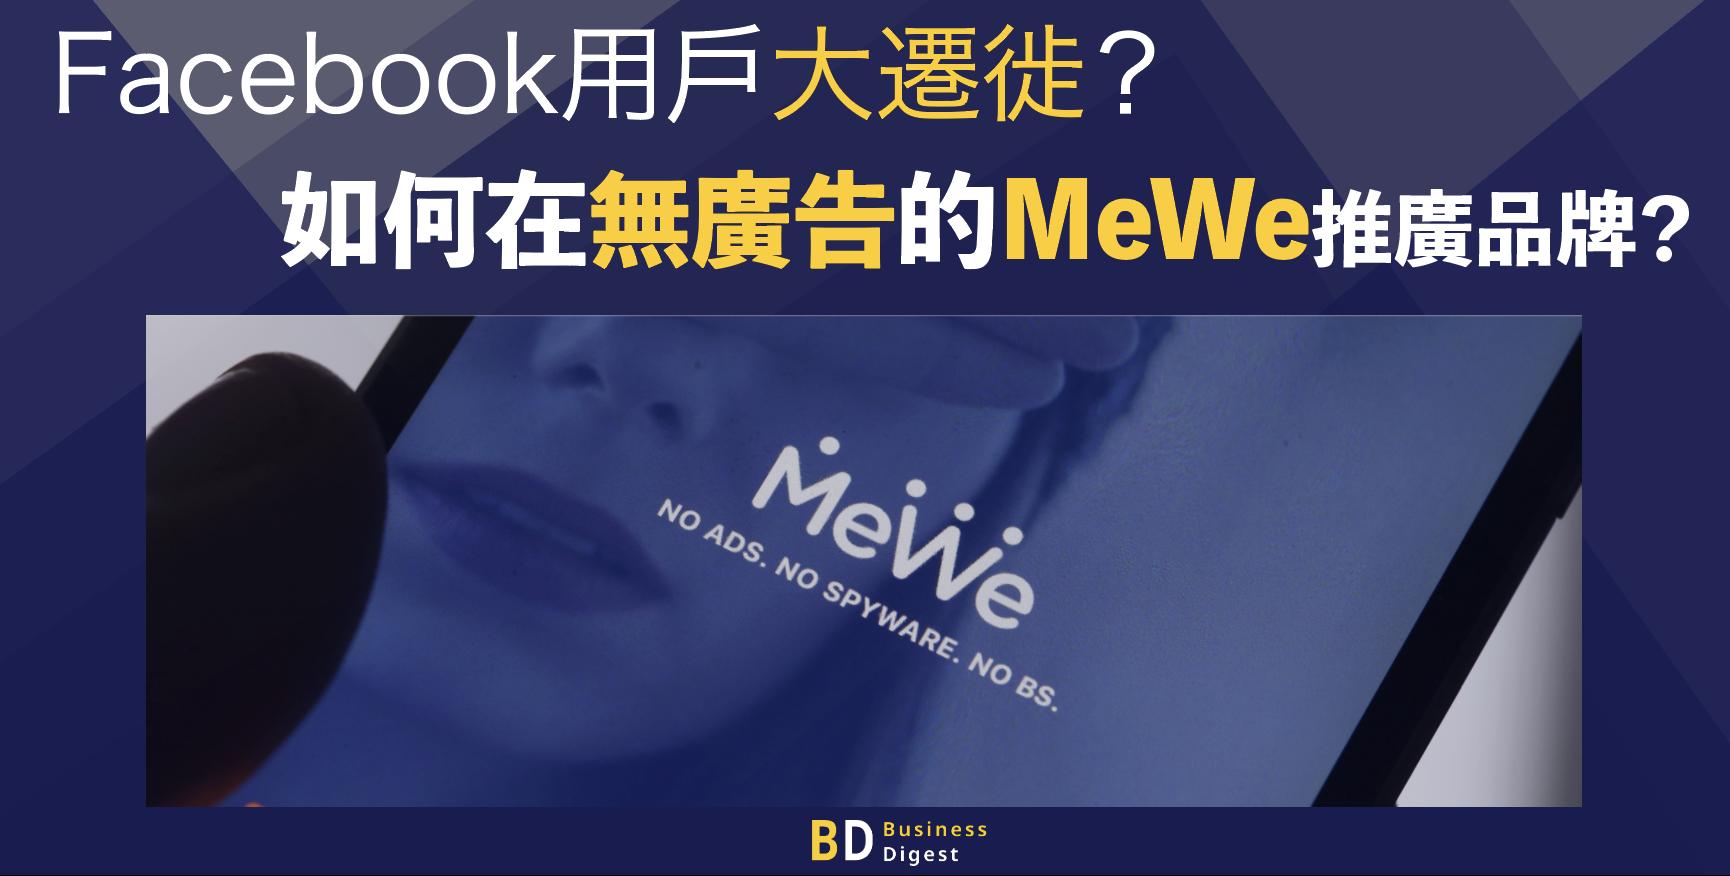 Mewe作為新出現的社交平台標榜著無廣告,倘若有一天MeWe成了主流社交平台,那麼一眾品牌,廣告商並不可能用Facebook的行銷手法在MeWe上宣傳,在MeWe上用戶生成的內容UGC有著舉足輕重的影響力,學會UGC的好處另行銷不再一樣。